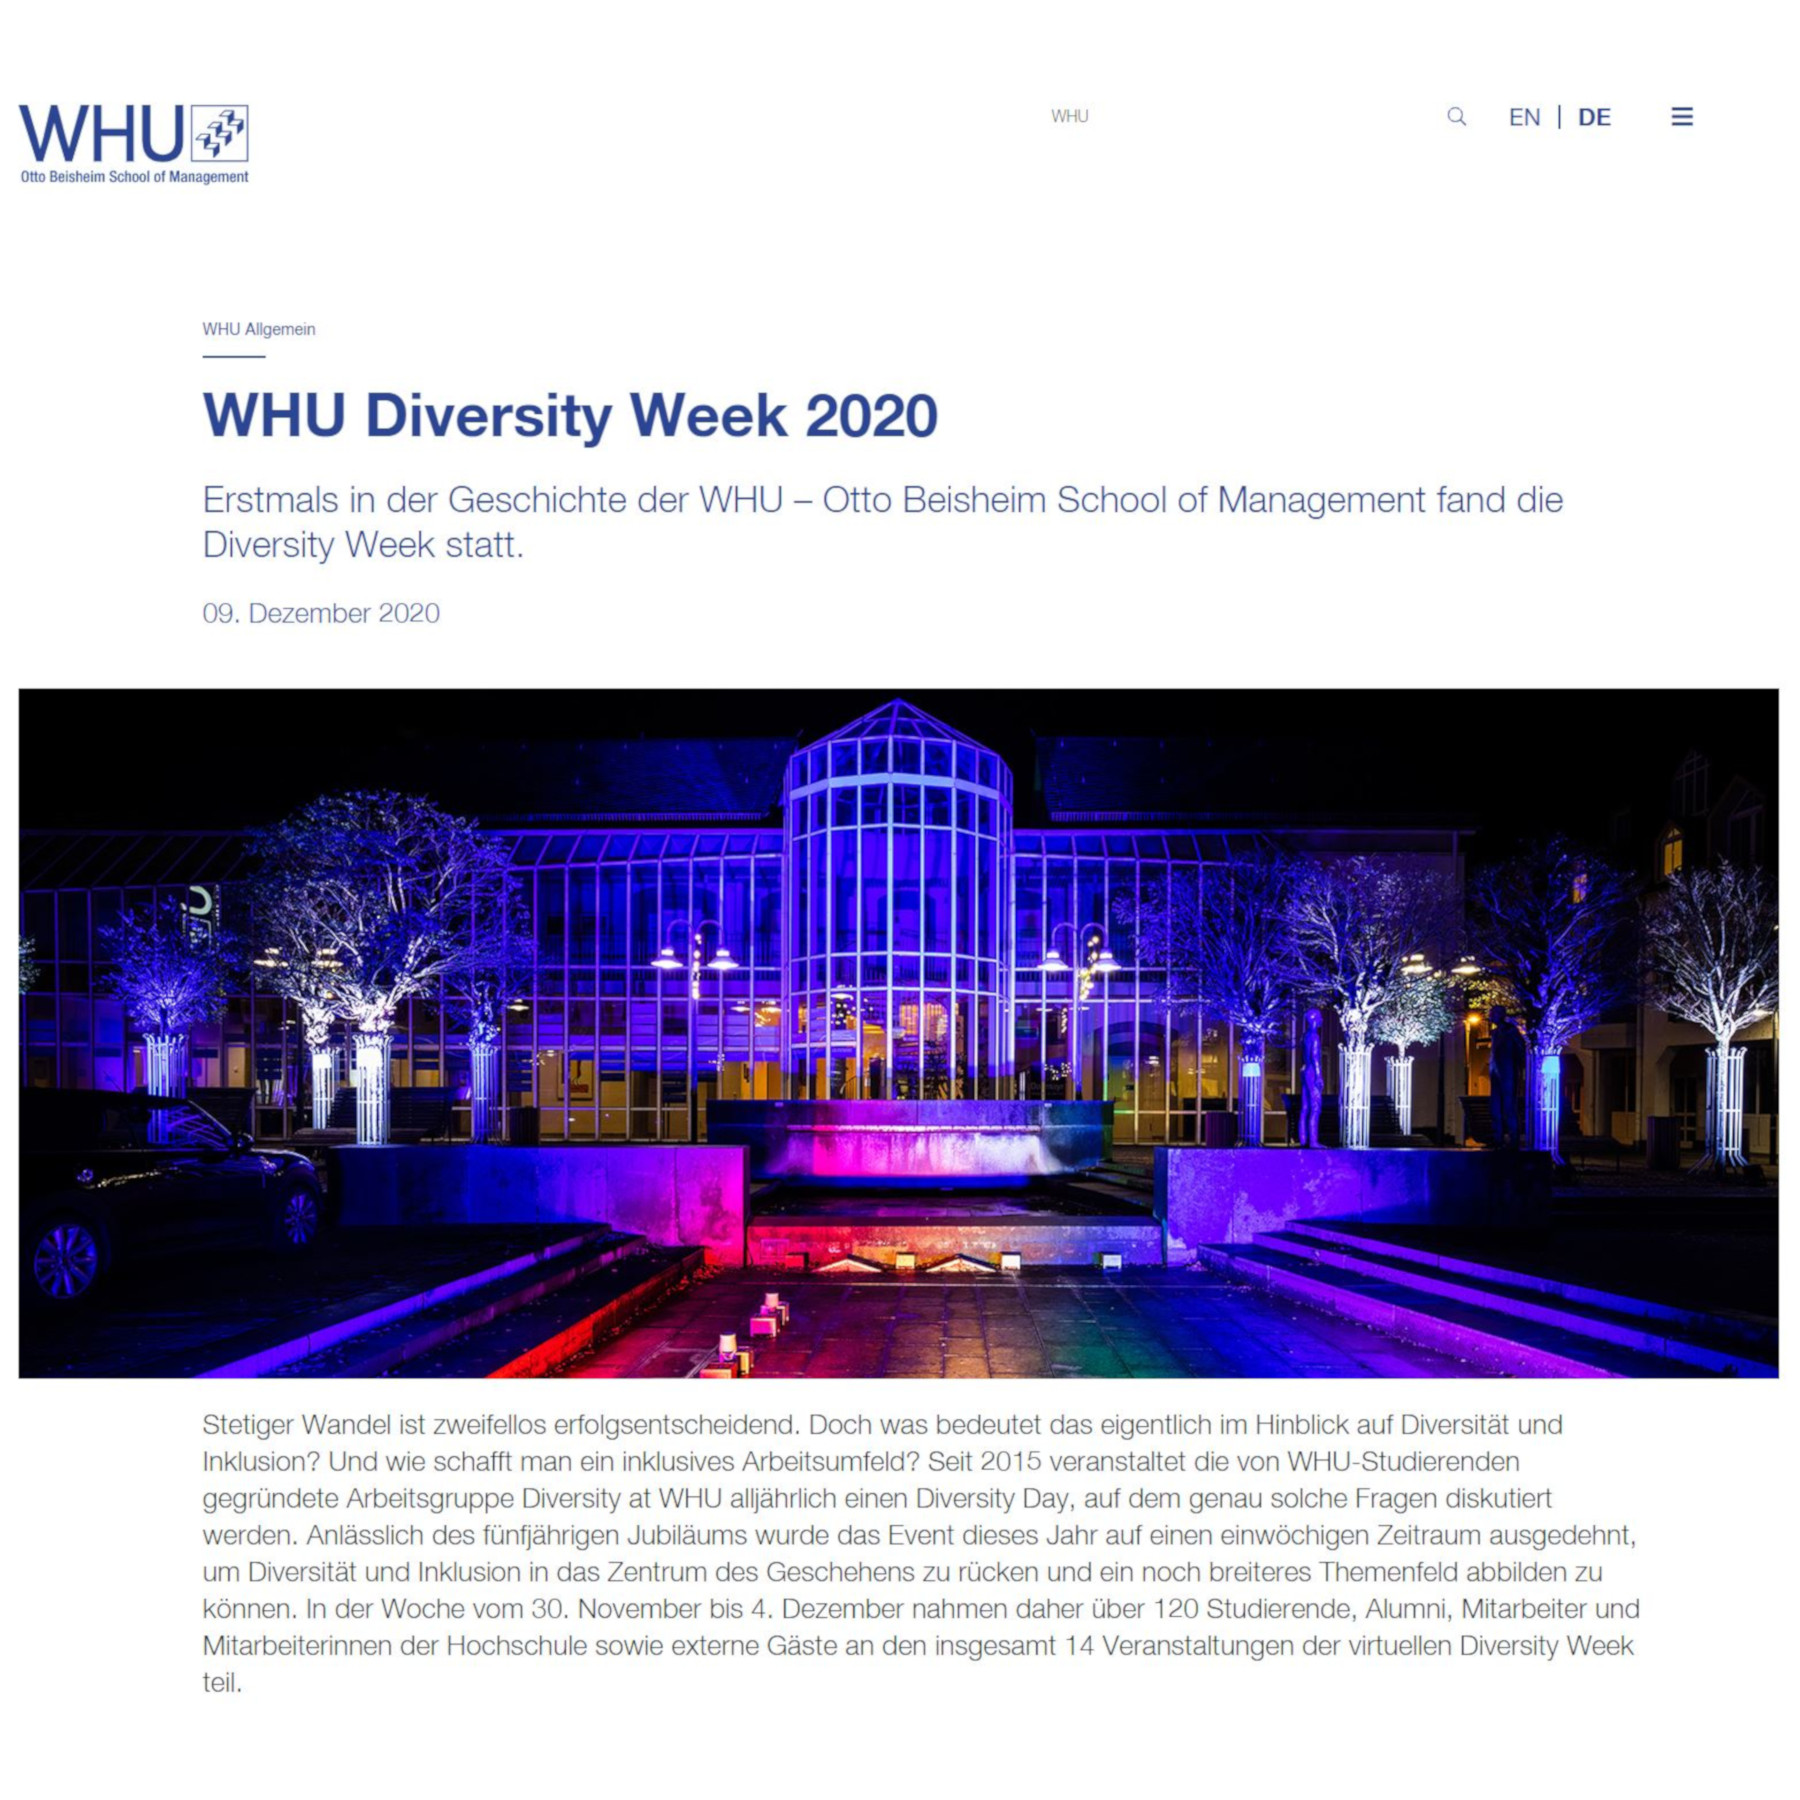 WHU Diversity Week 2020